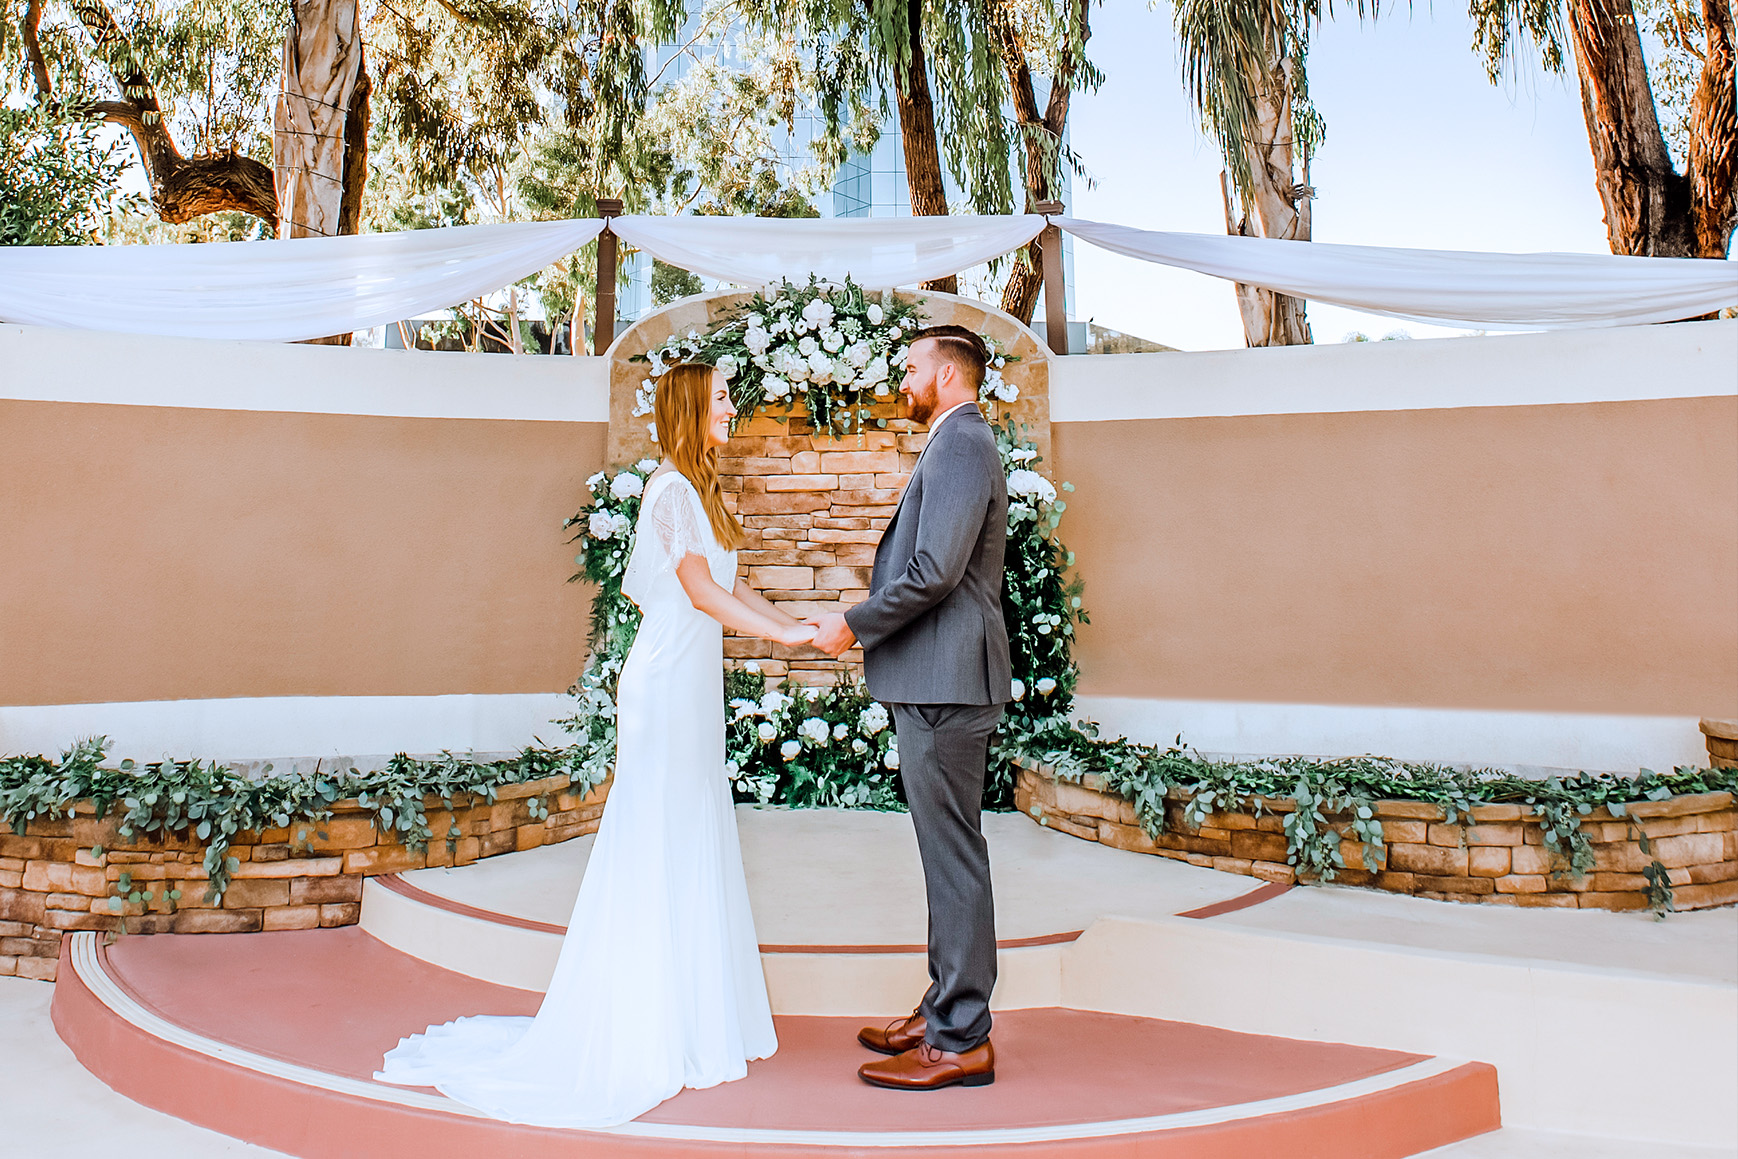 Pacific View Tower Club - Oxnard, California - Ventura County - Garden Ceremony